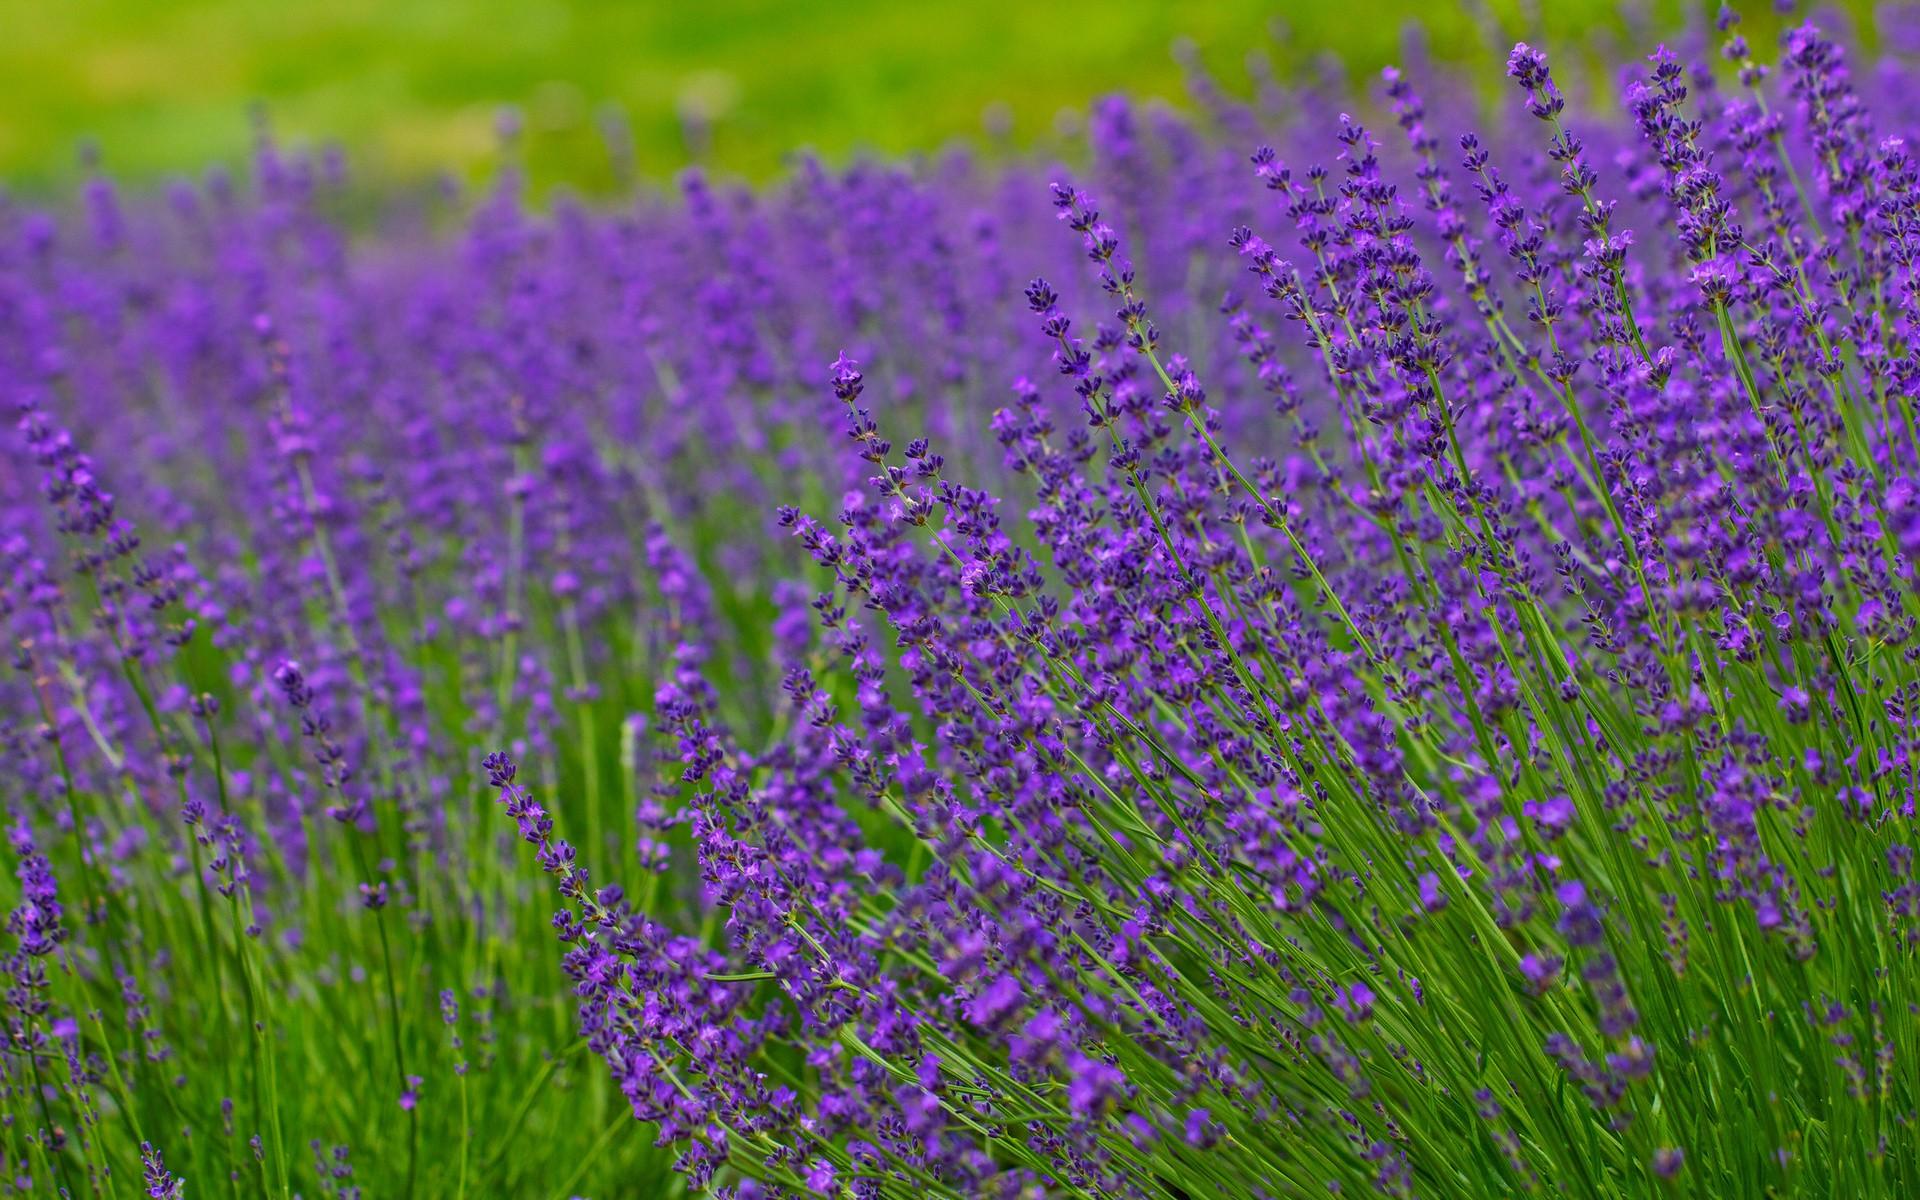 Lavender field hd wallpaper background   HD Wallpapers 1920x1200